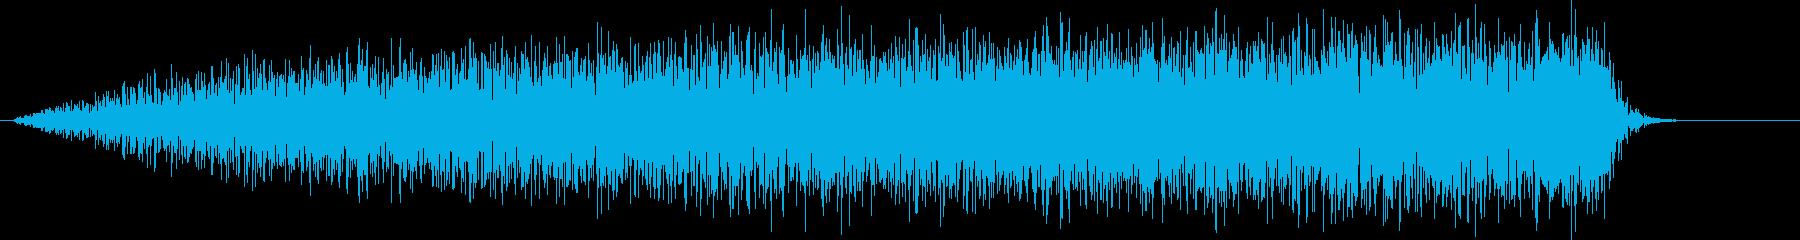 SE 高音ノイズ ギューンDWONの再生済みの波形